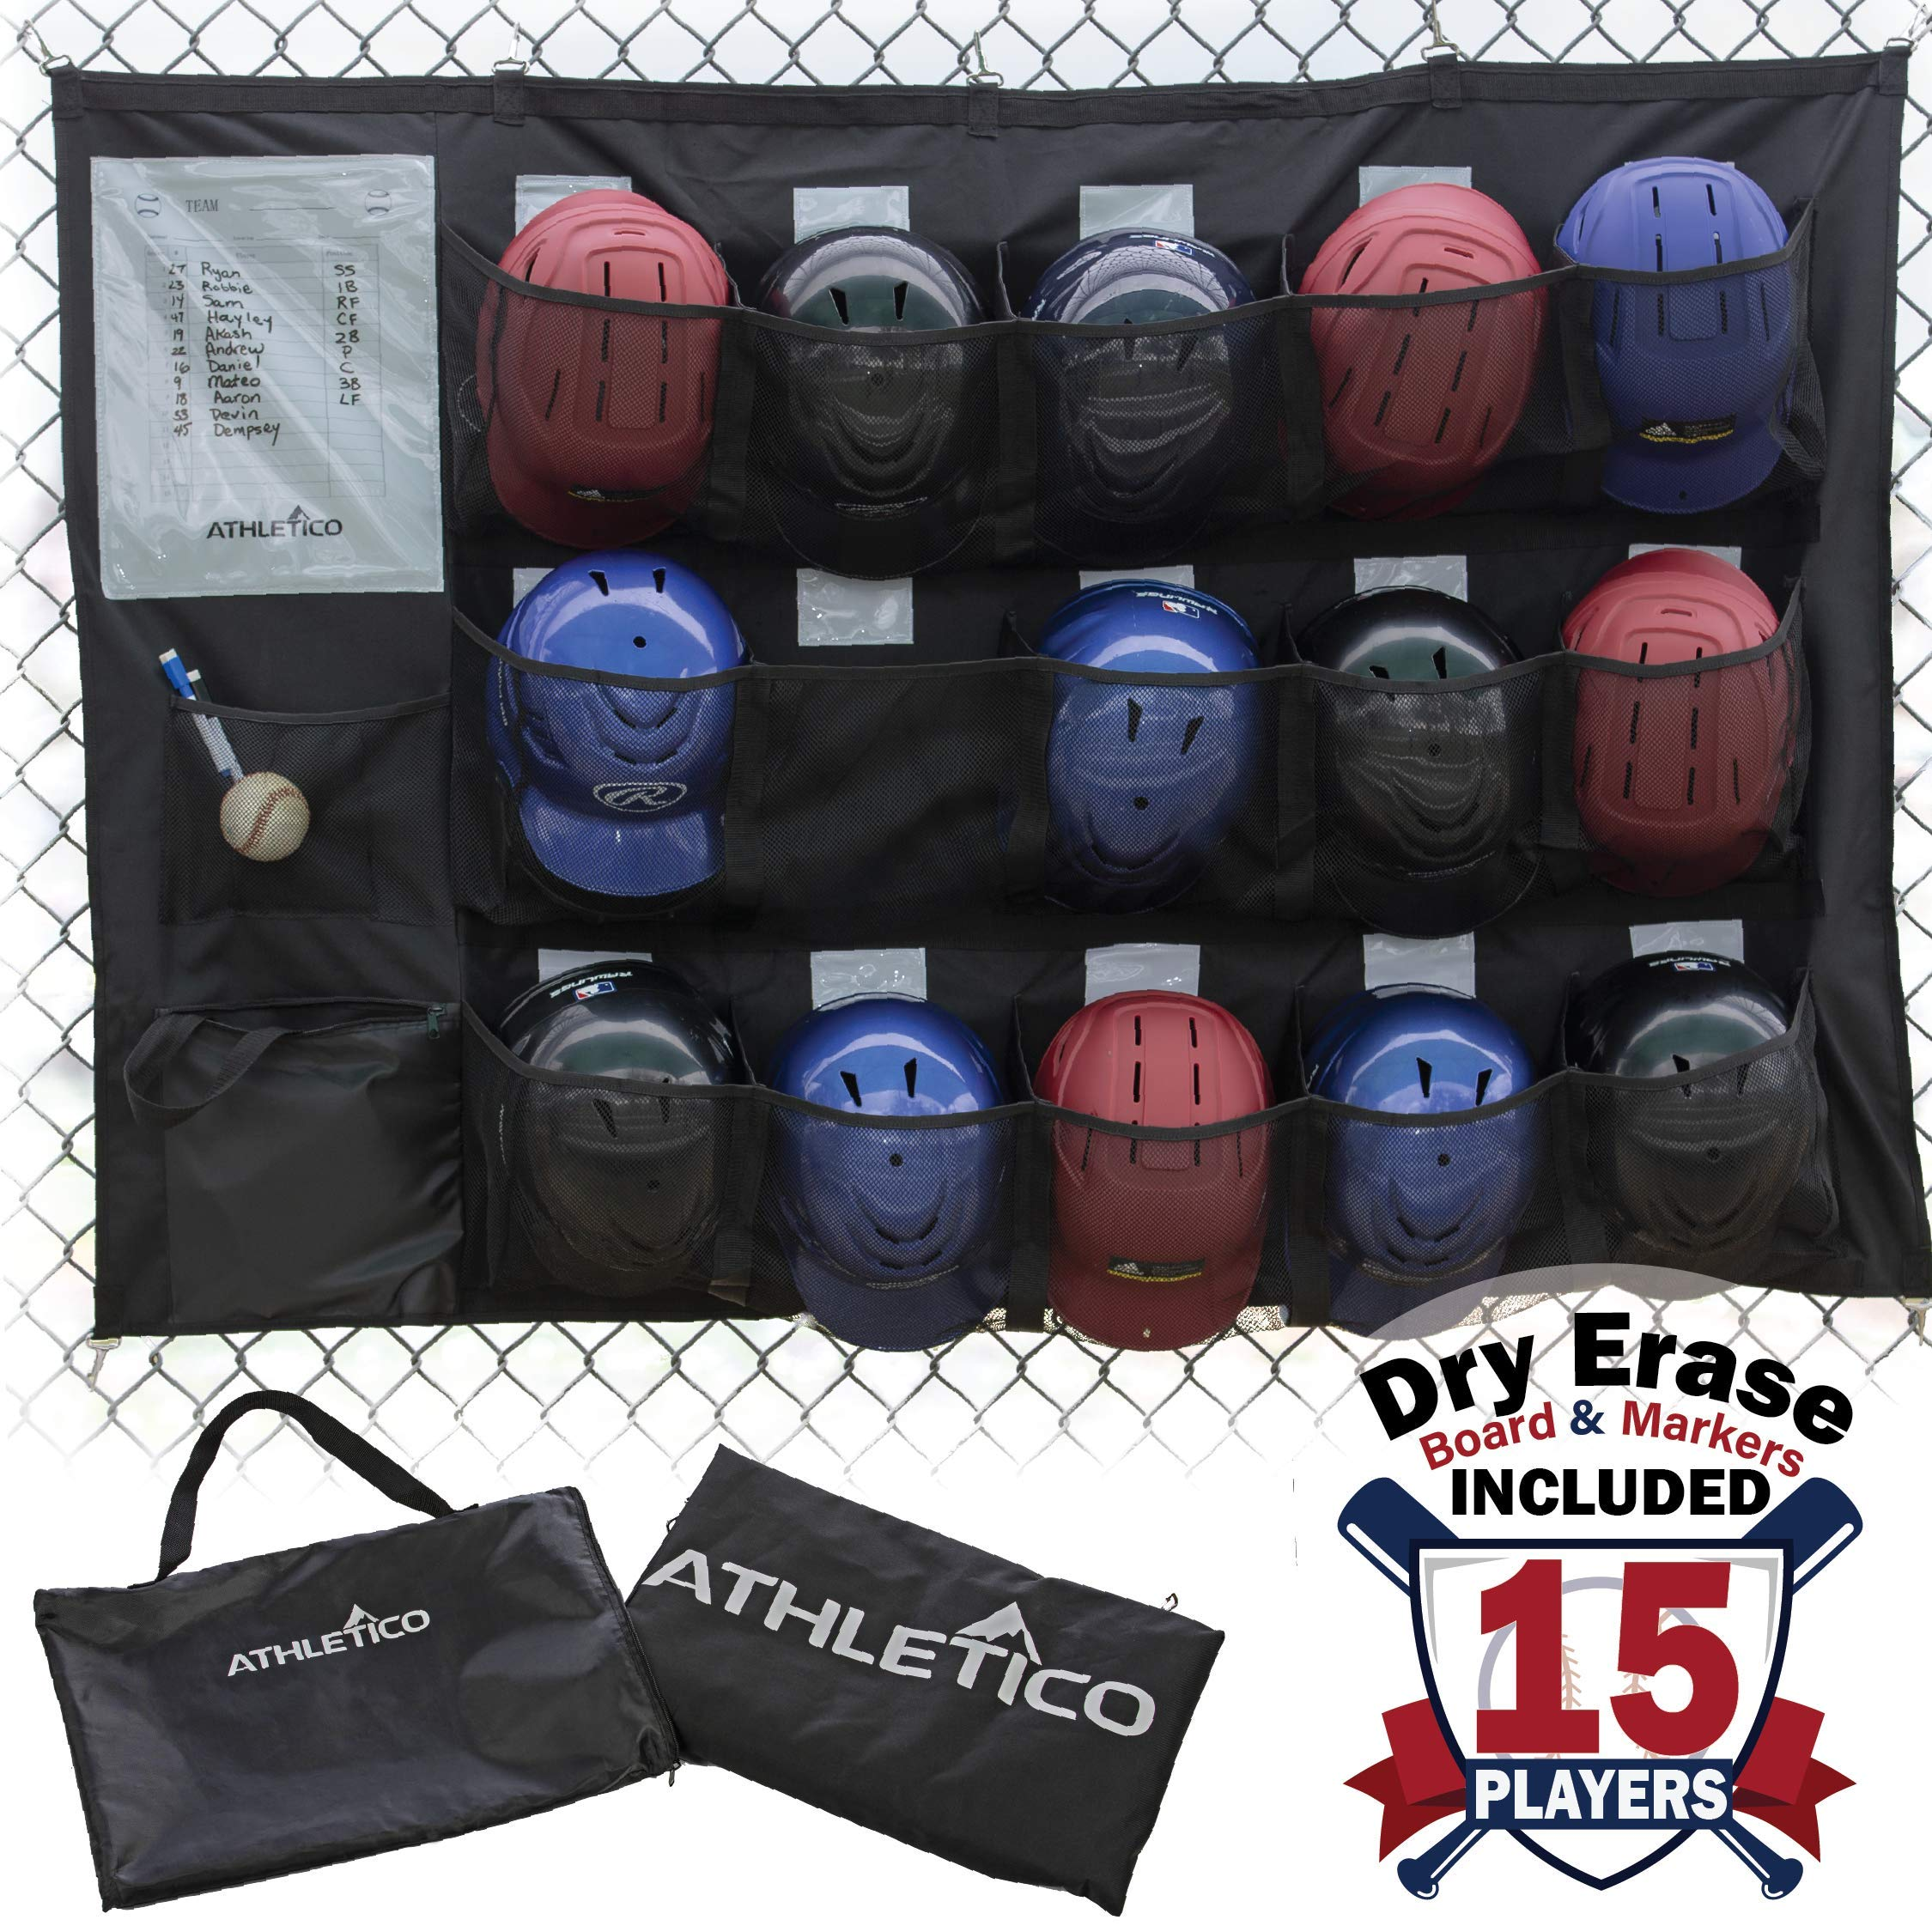 Athletico 15 Player Dugout Organizer - Hanging Baseball Helmet Bag to Organize Baseball Equipment Including Gloves, Helmets, Batting Gloves, Balls, More by Athletico